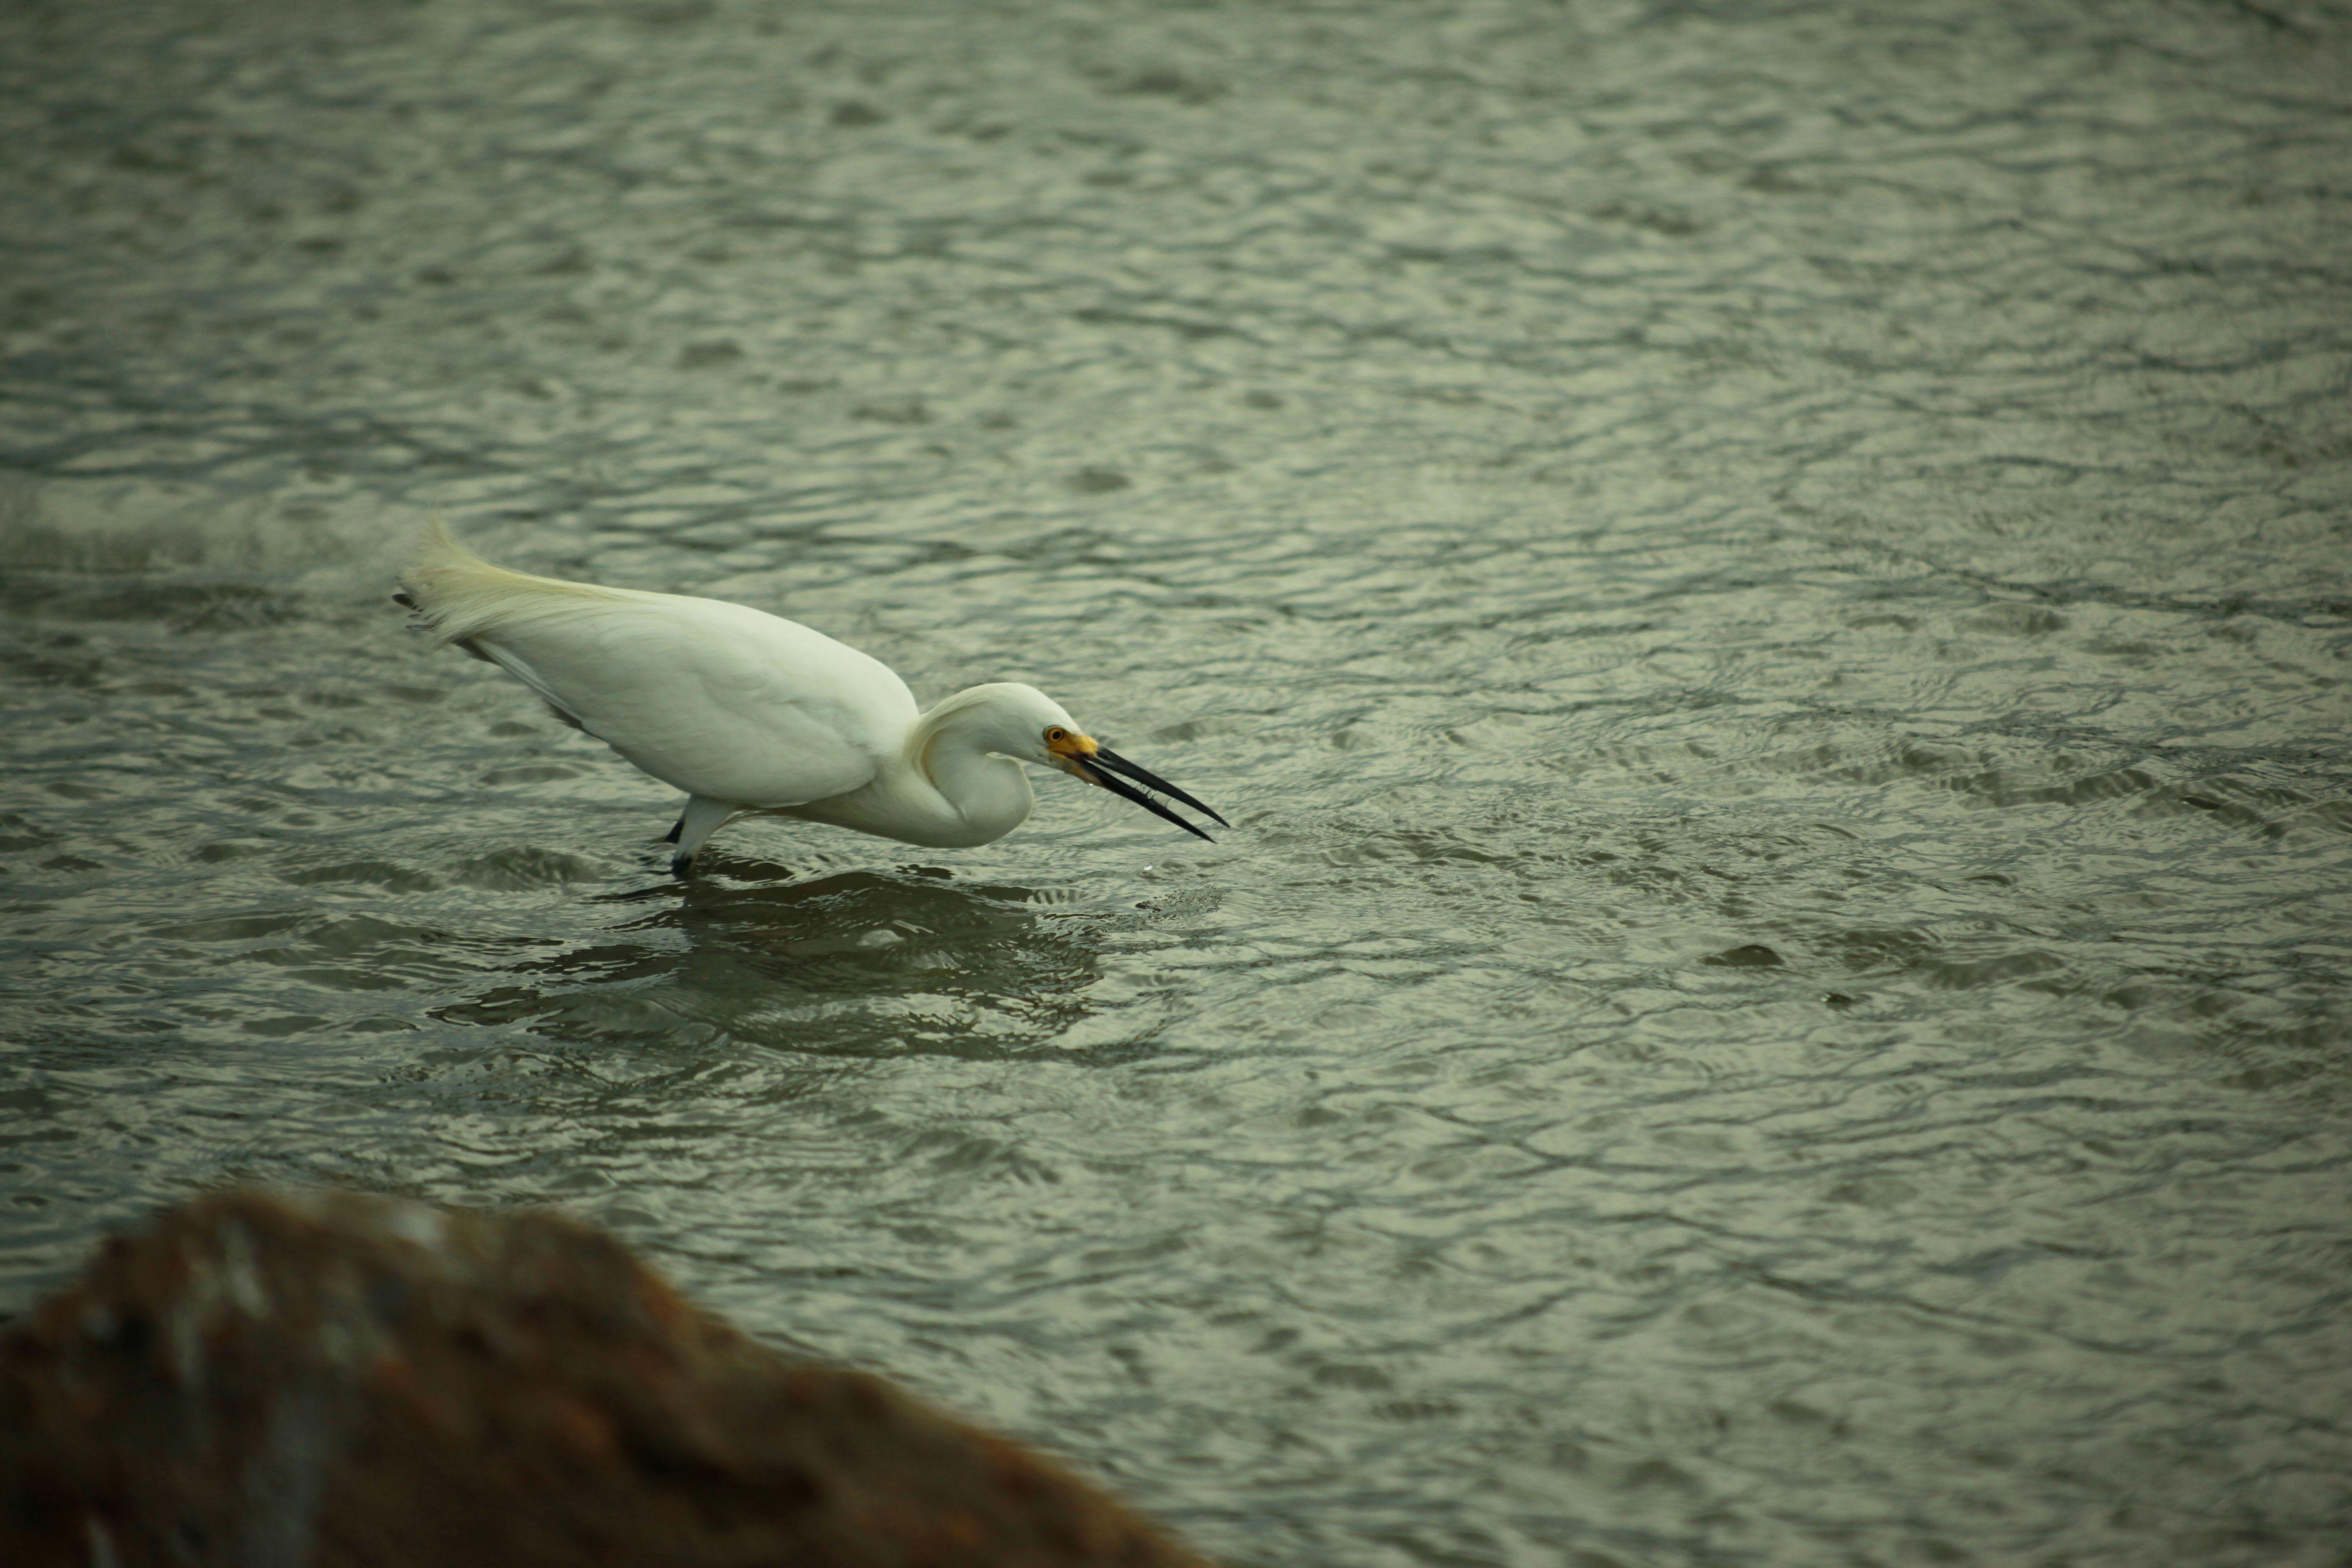 sea bird waits for fish